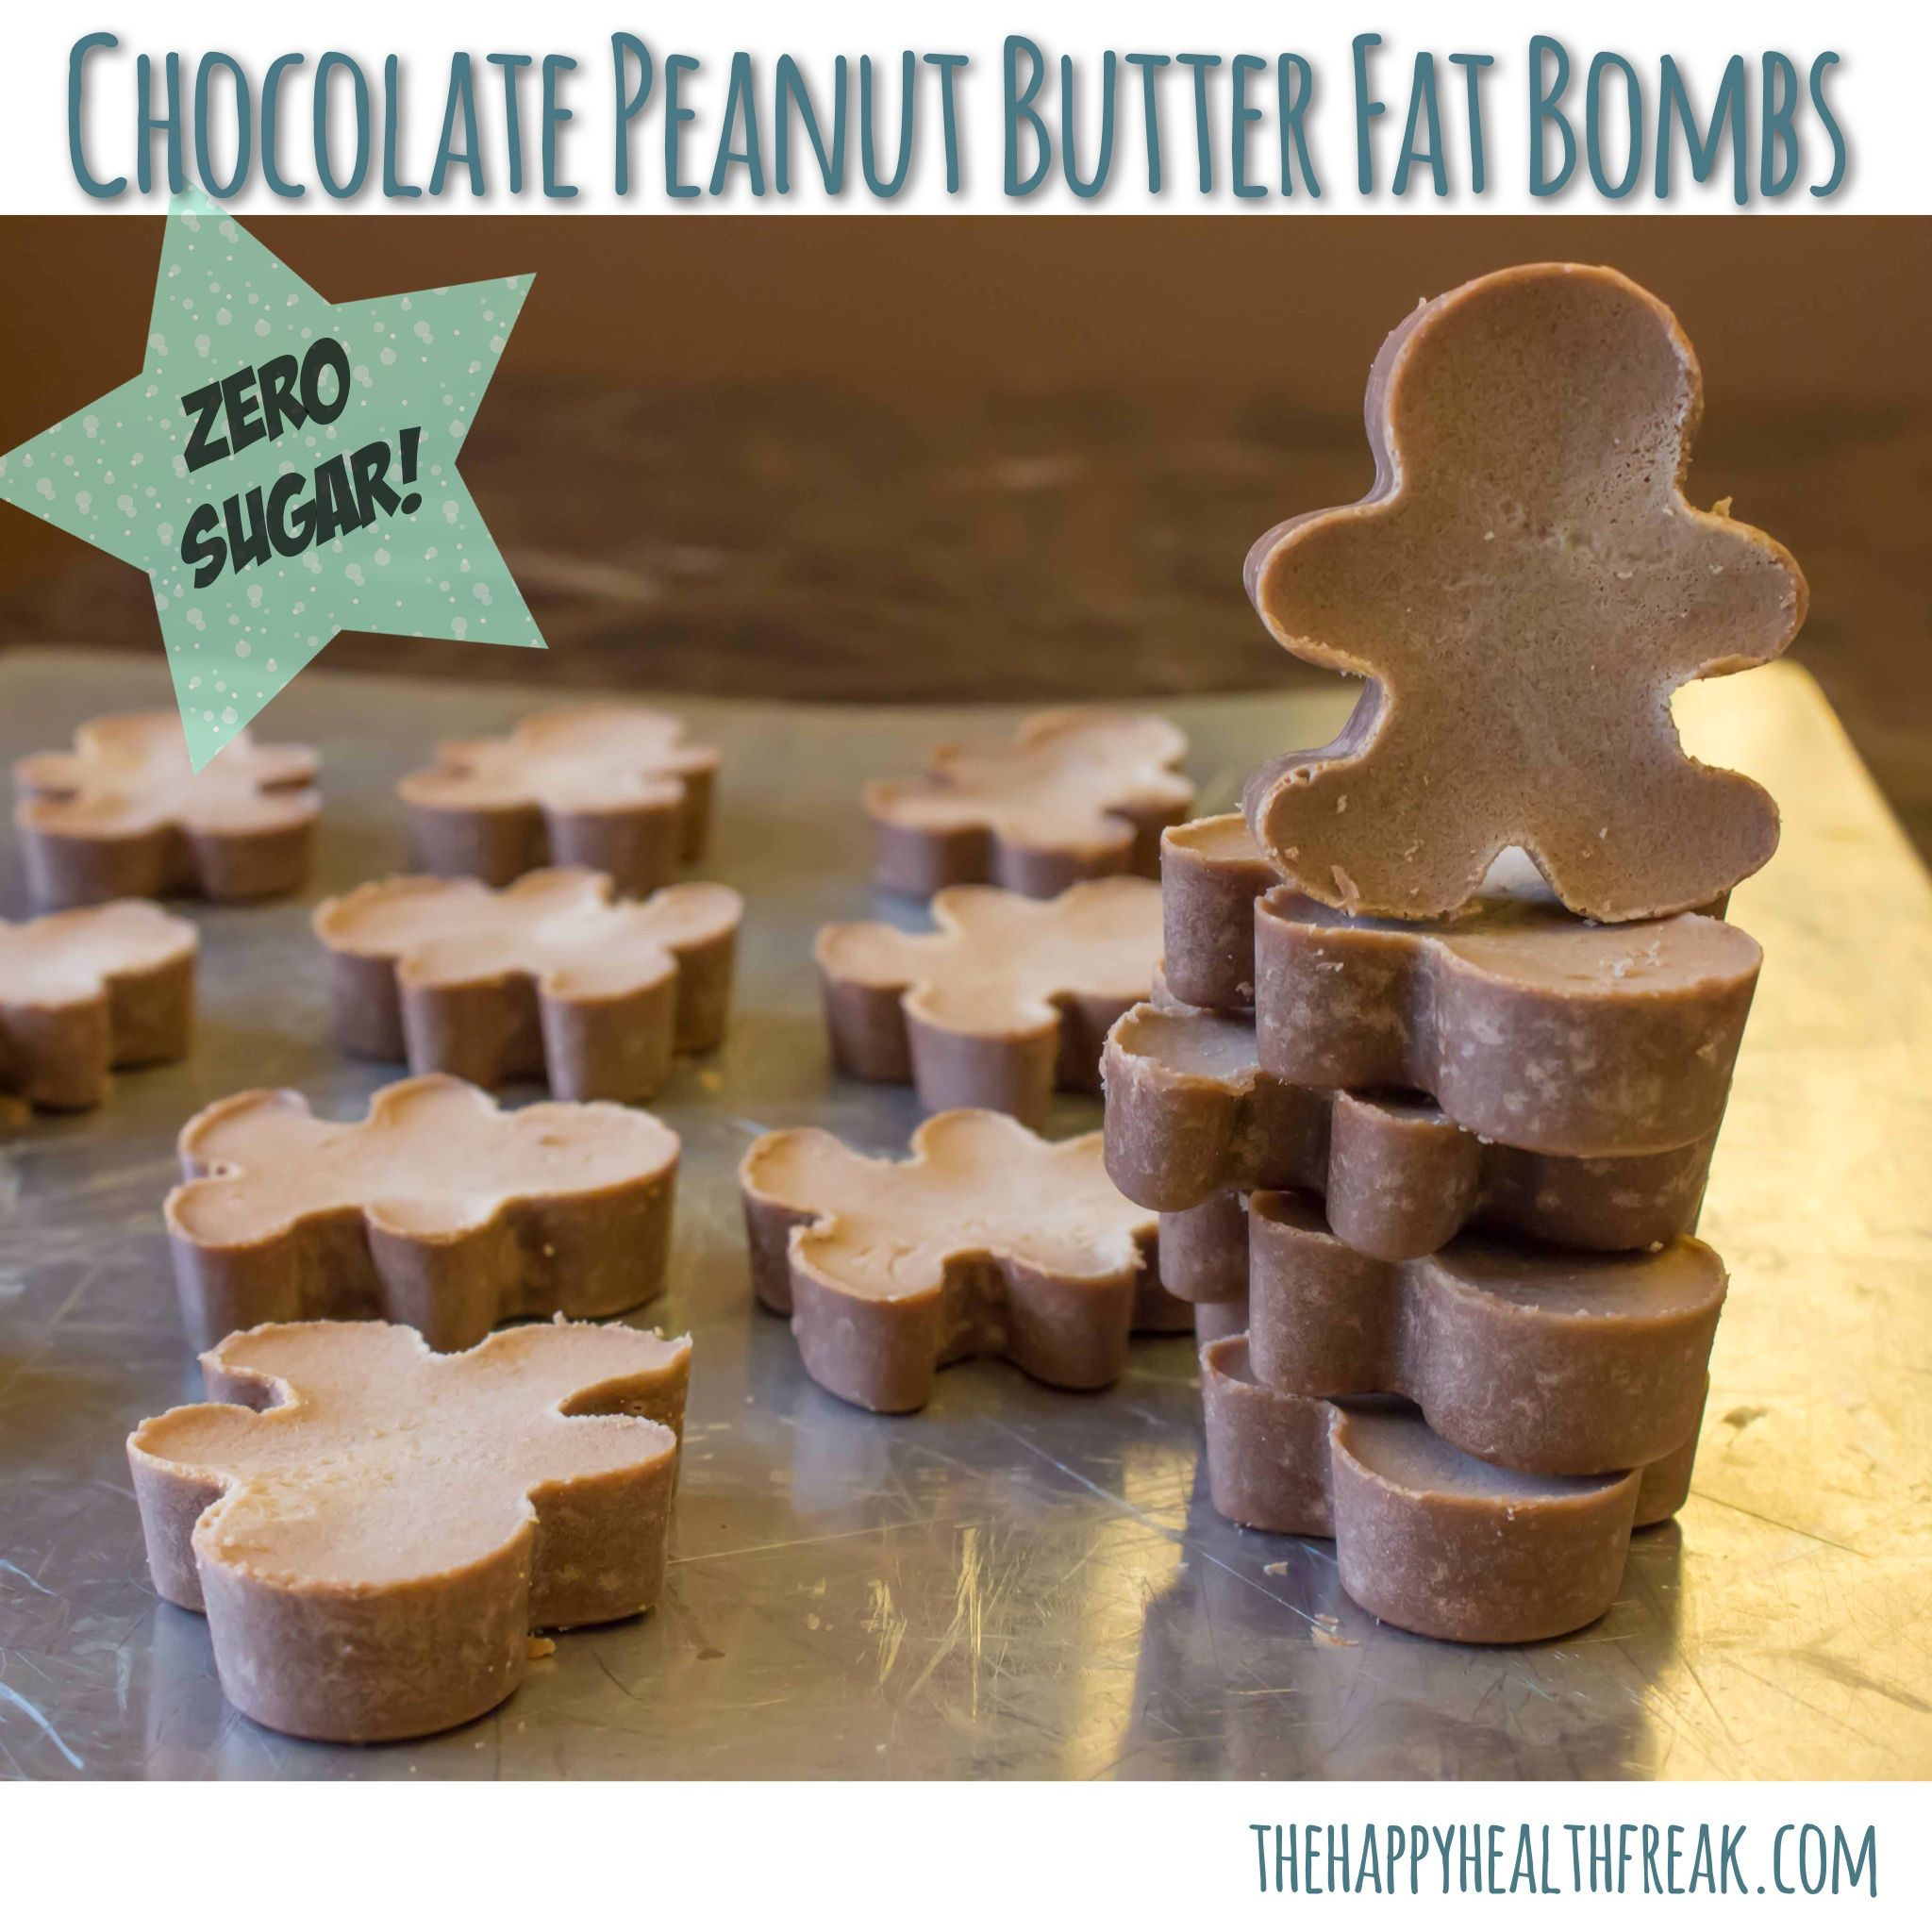 Chocolate nut butter fat bombs (use sun butter or almond butter)